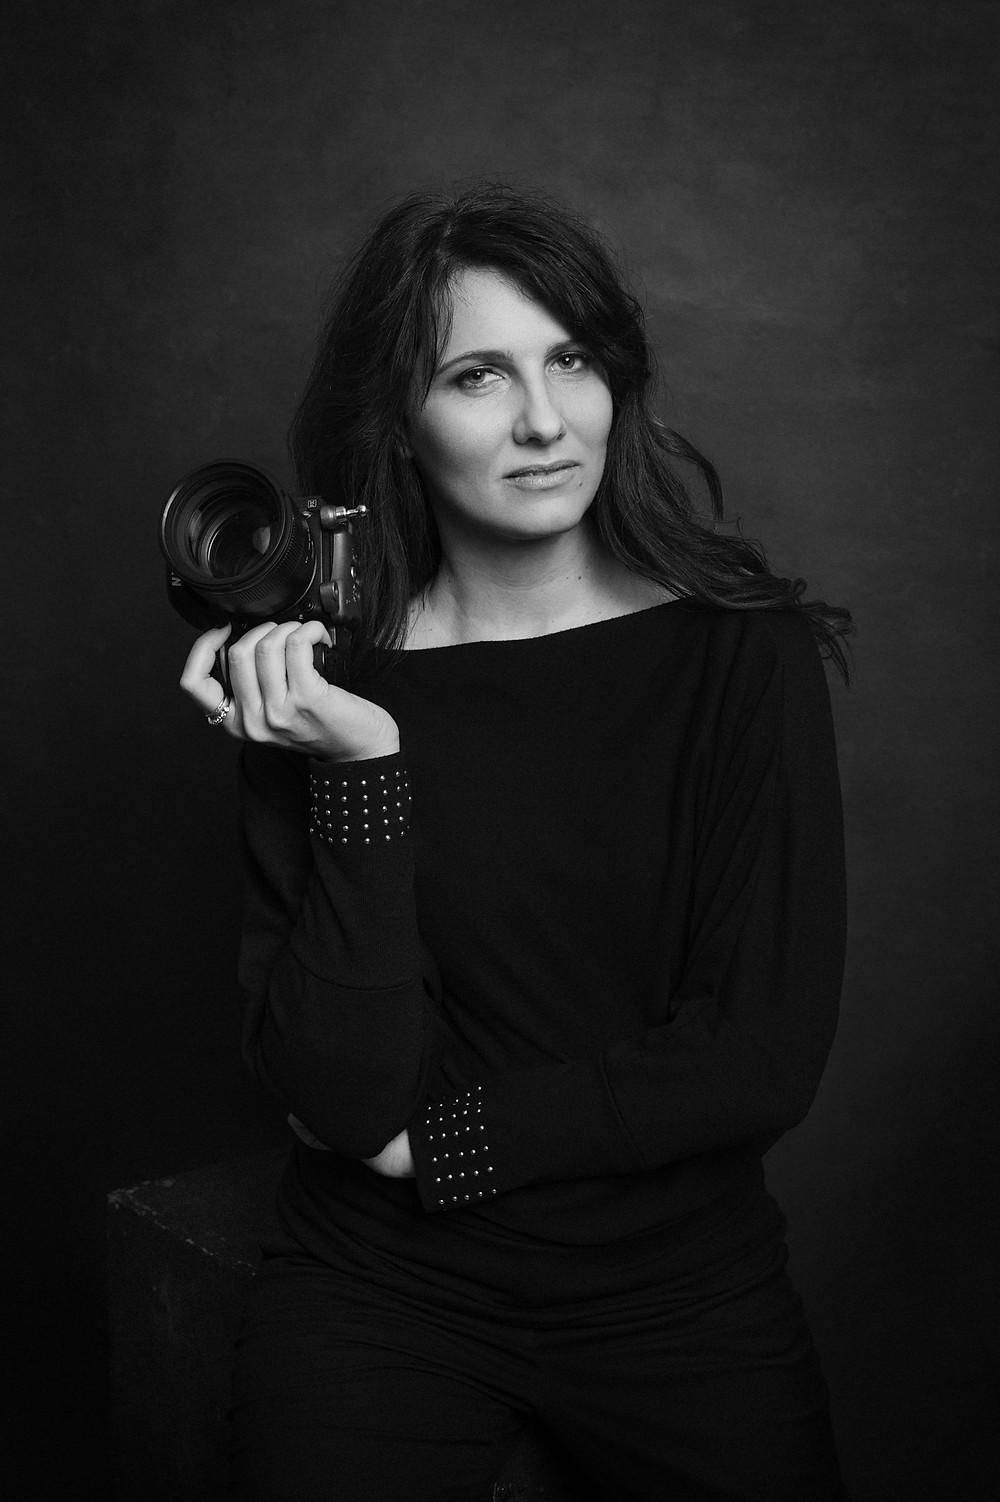 federica nardese fotografa di ritratto milano novara fotografia di ritratto milano business portrait headshots magazine style portraits